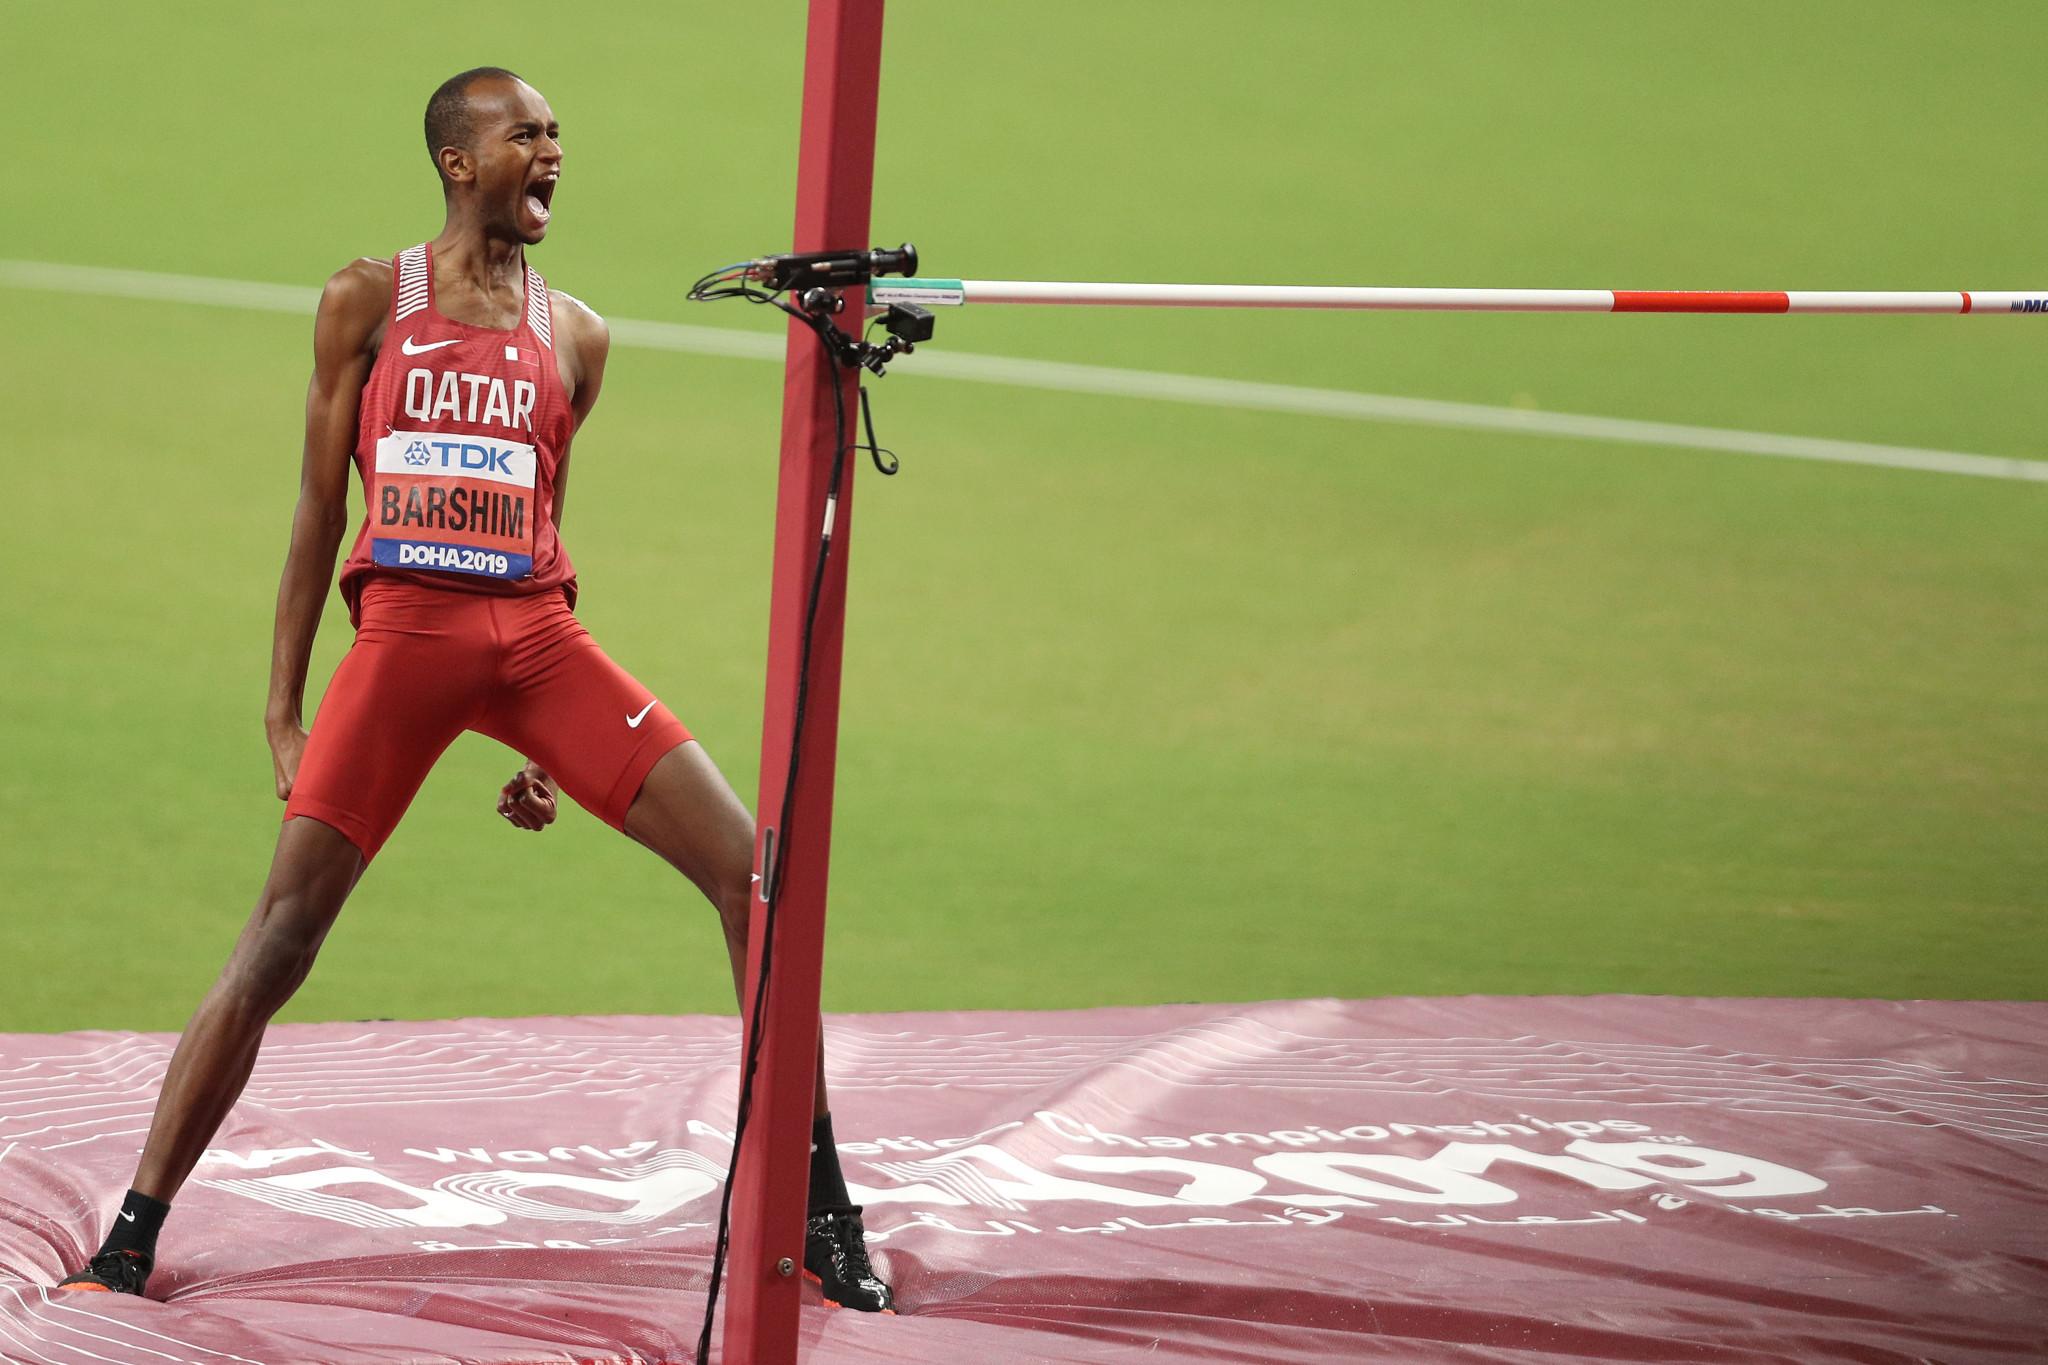 Two-time high jump world champion Mutaz Essa Barshim has backed the Doha 2030 Asian Games bid ©Getty Images